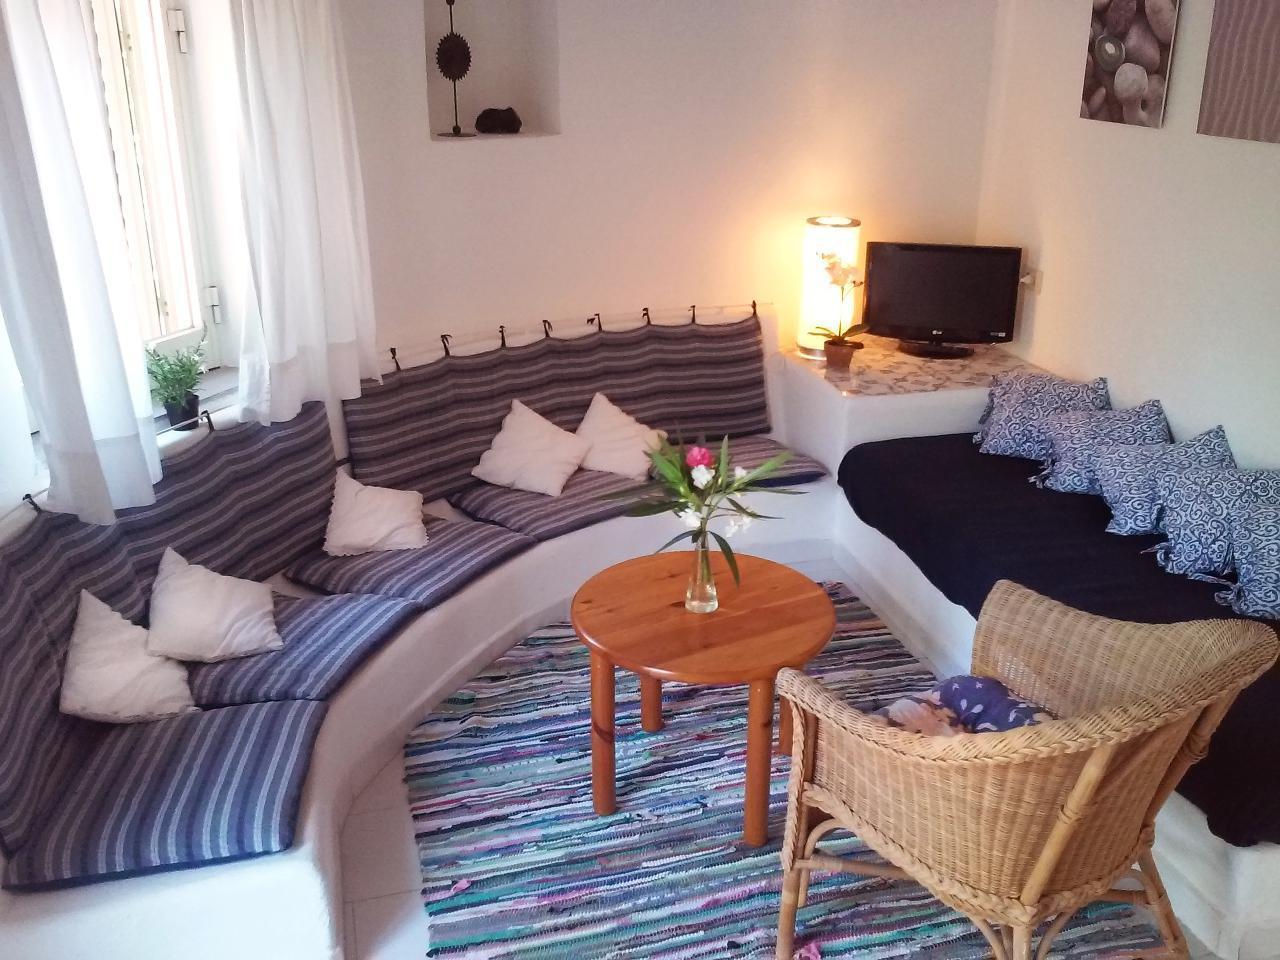 Maison de vacances Ferienhaushälfte Solandra auf sizilianischer Insel mit atemberaubenden Meeres-Rundblick (2038046), Lipari, Lipari, Sicile, Italie, image 11